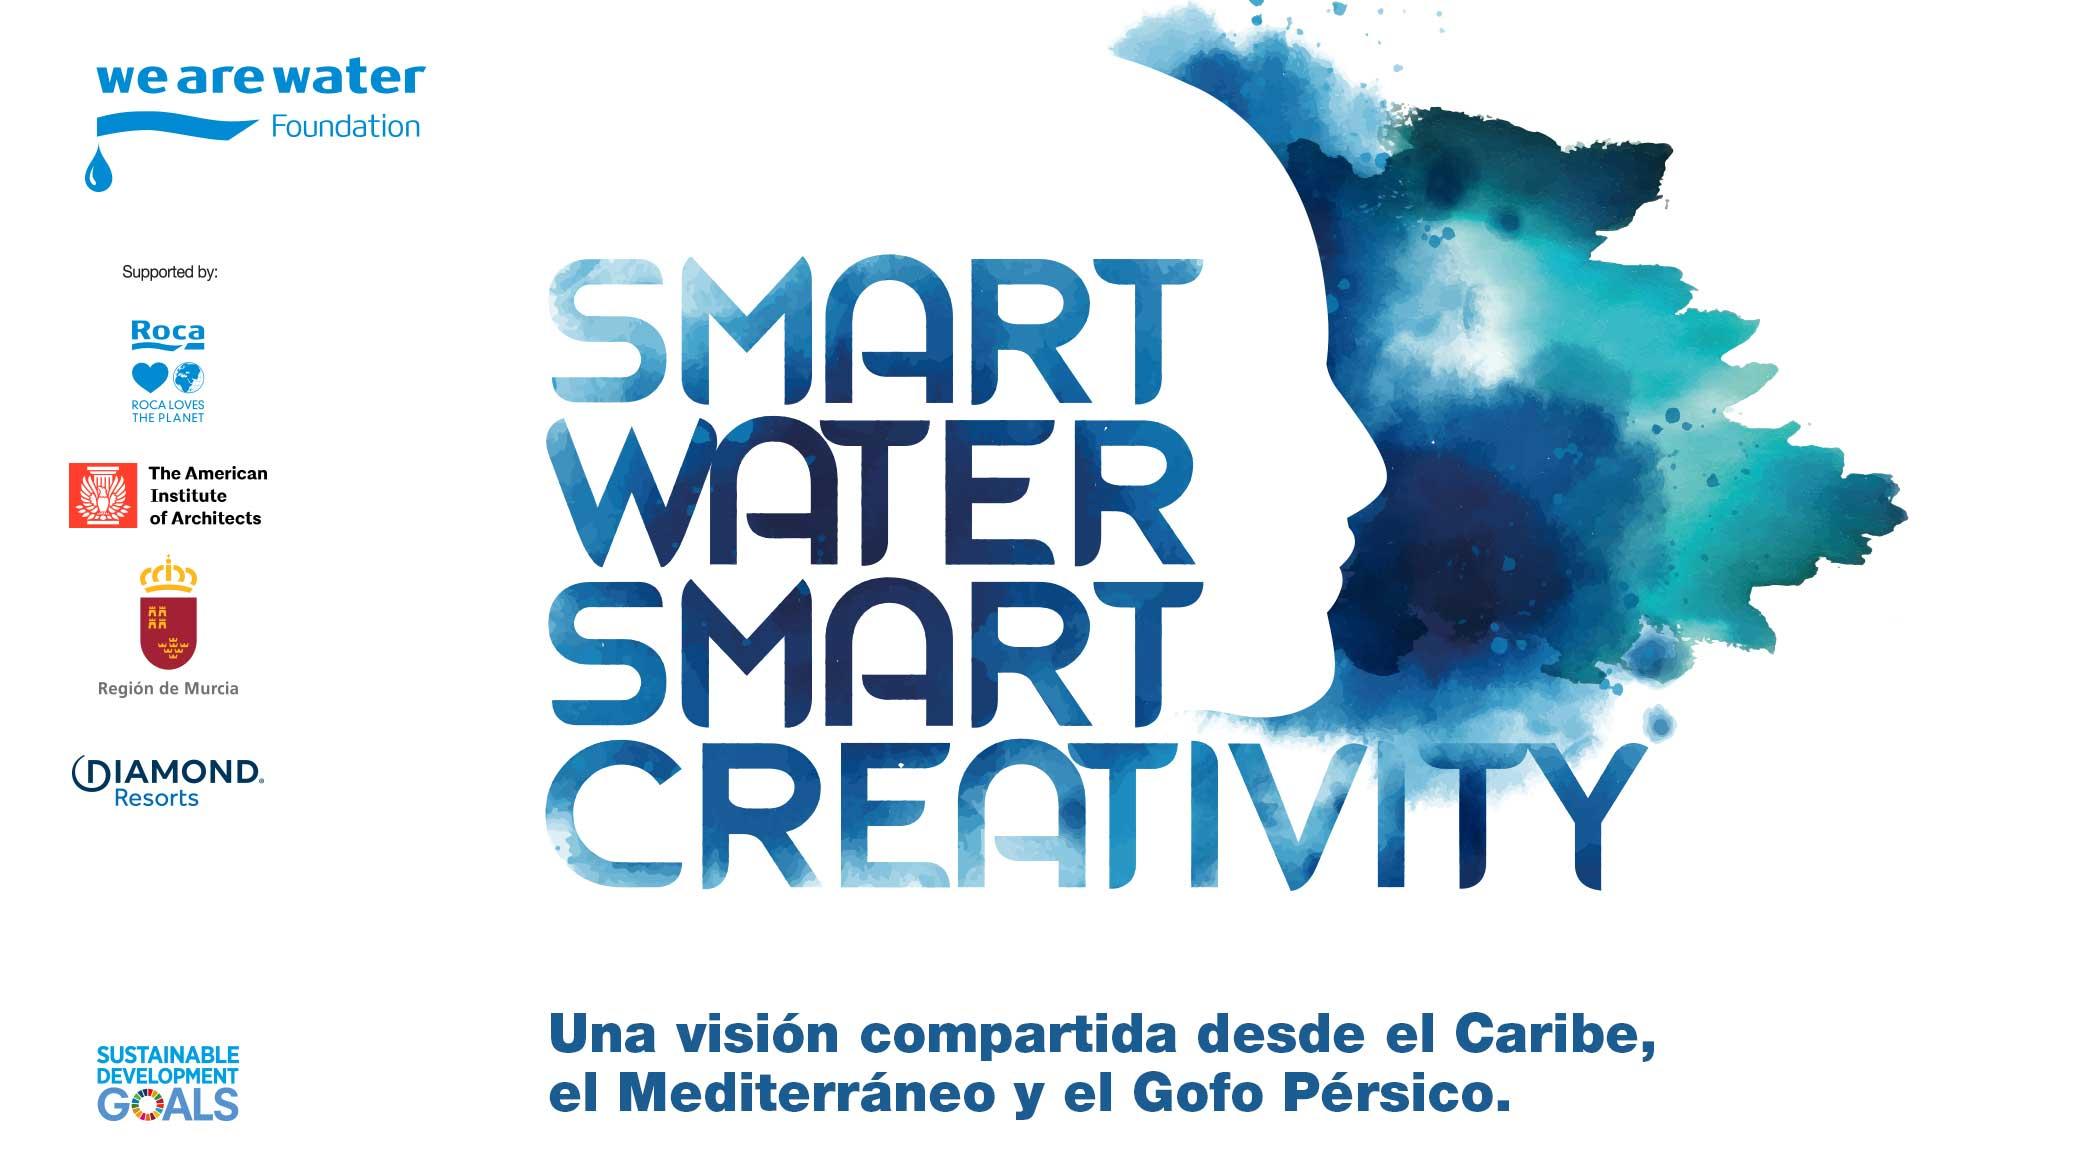 smart water, smart creativity